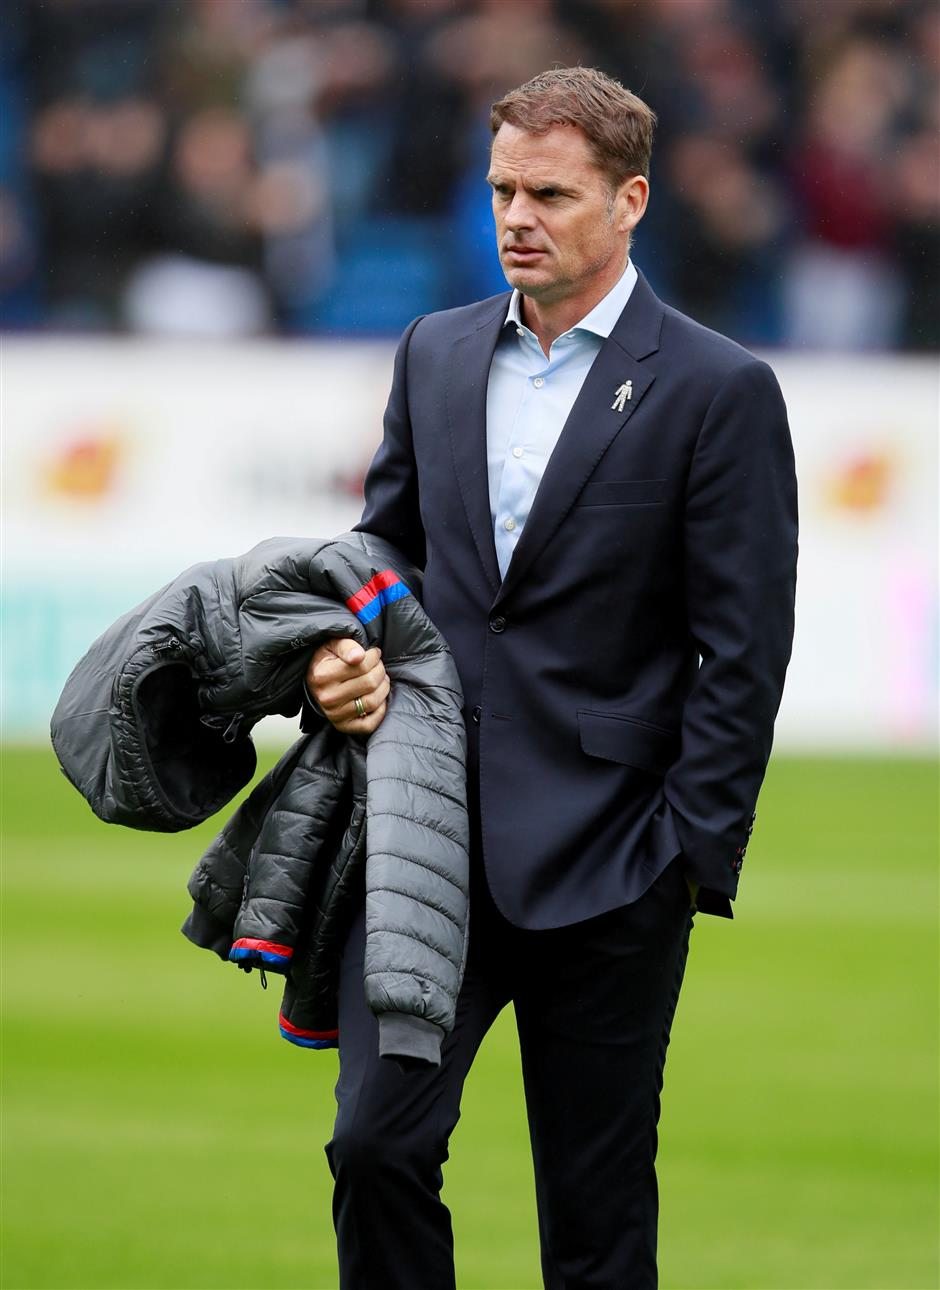 Palace sacks de Boer after nightmare start